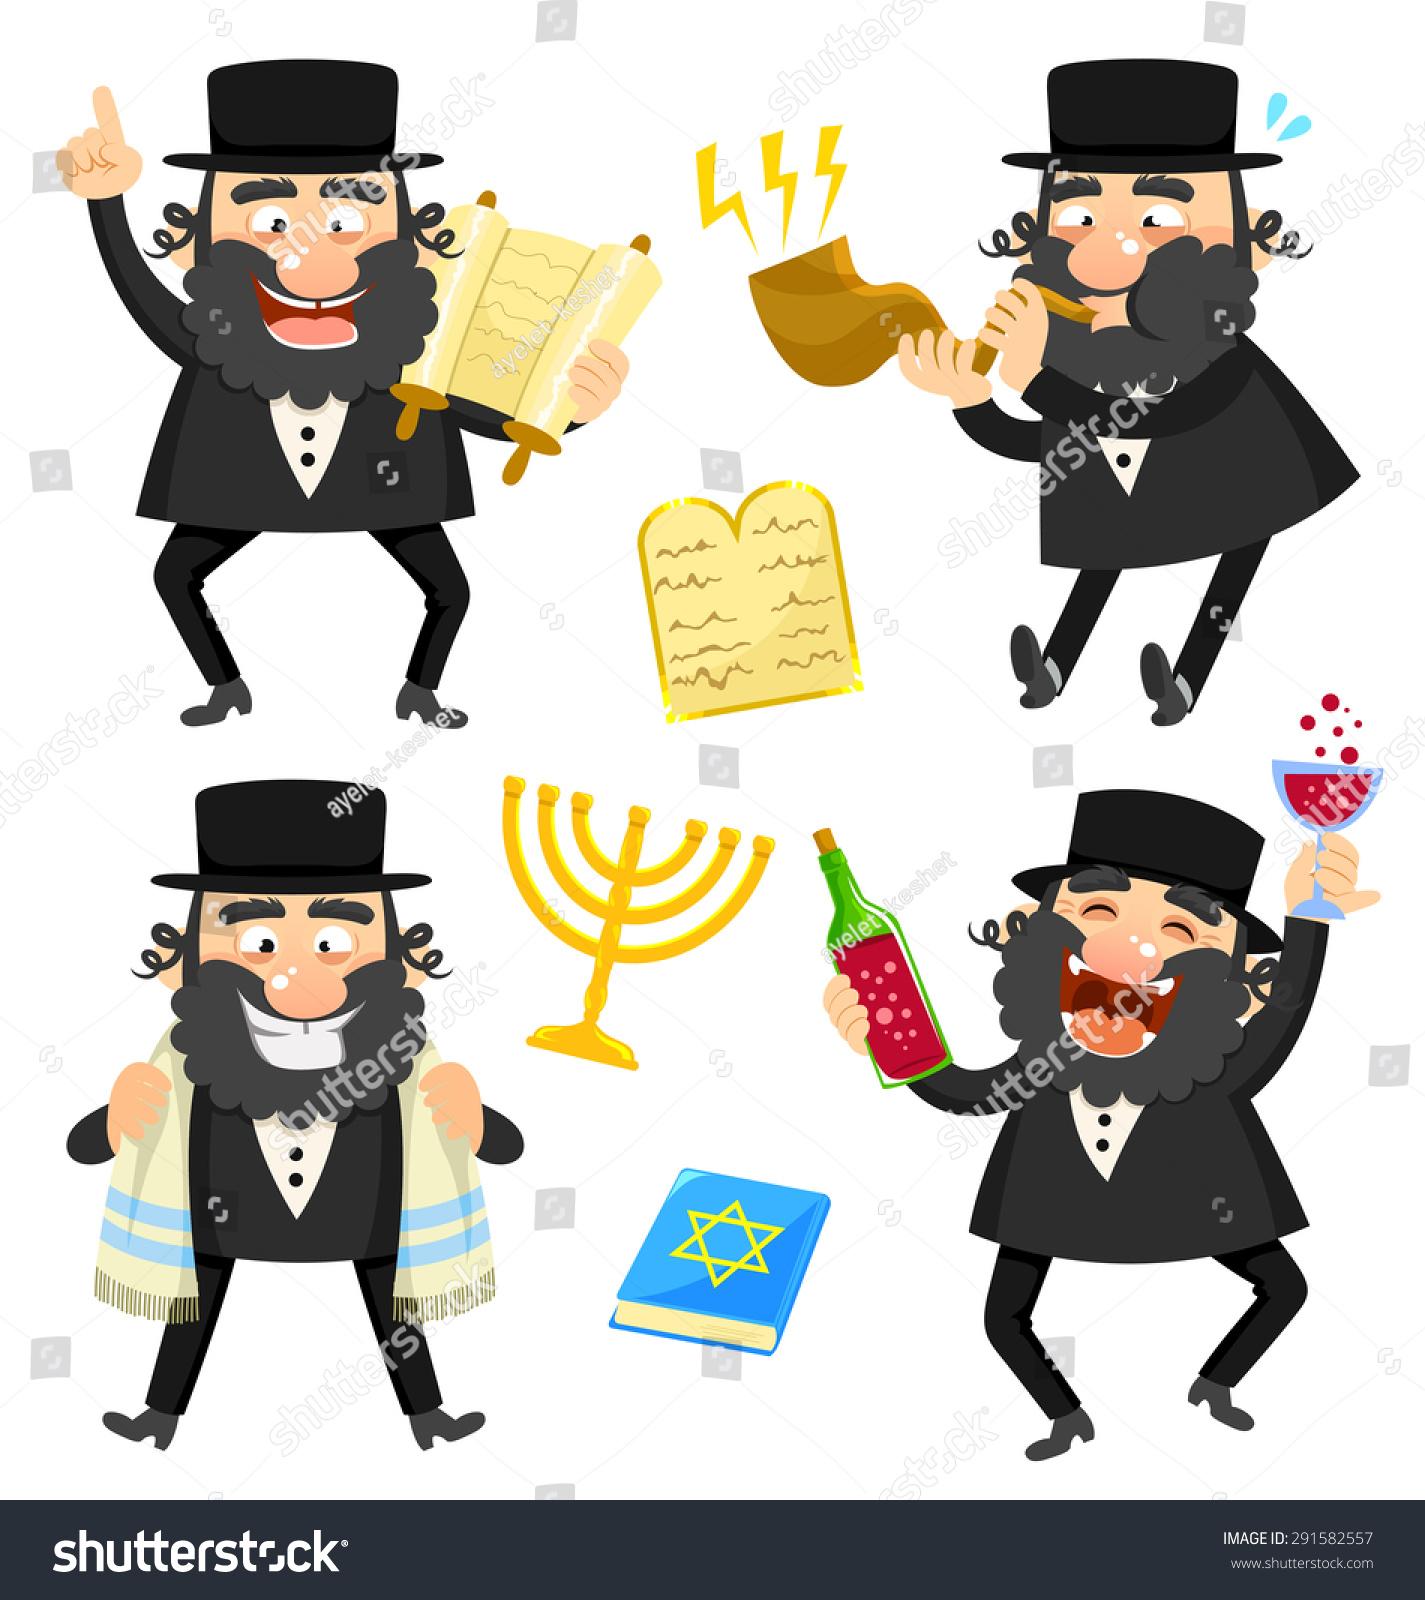 Royalty Free Stock Illustration Of Set Cartoon Rabbis Jewish Symbols